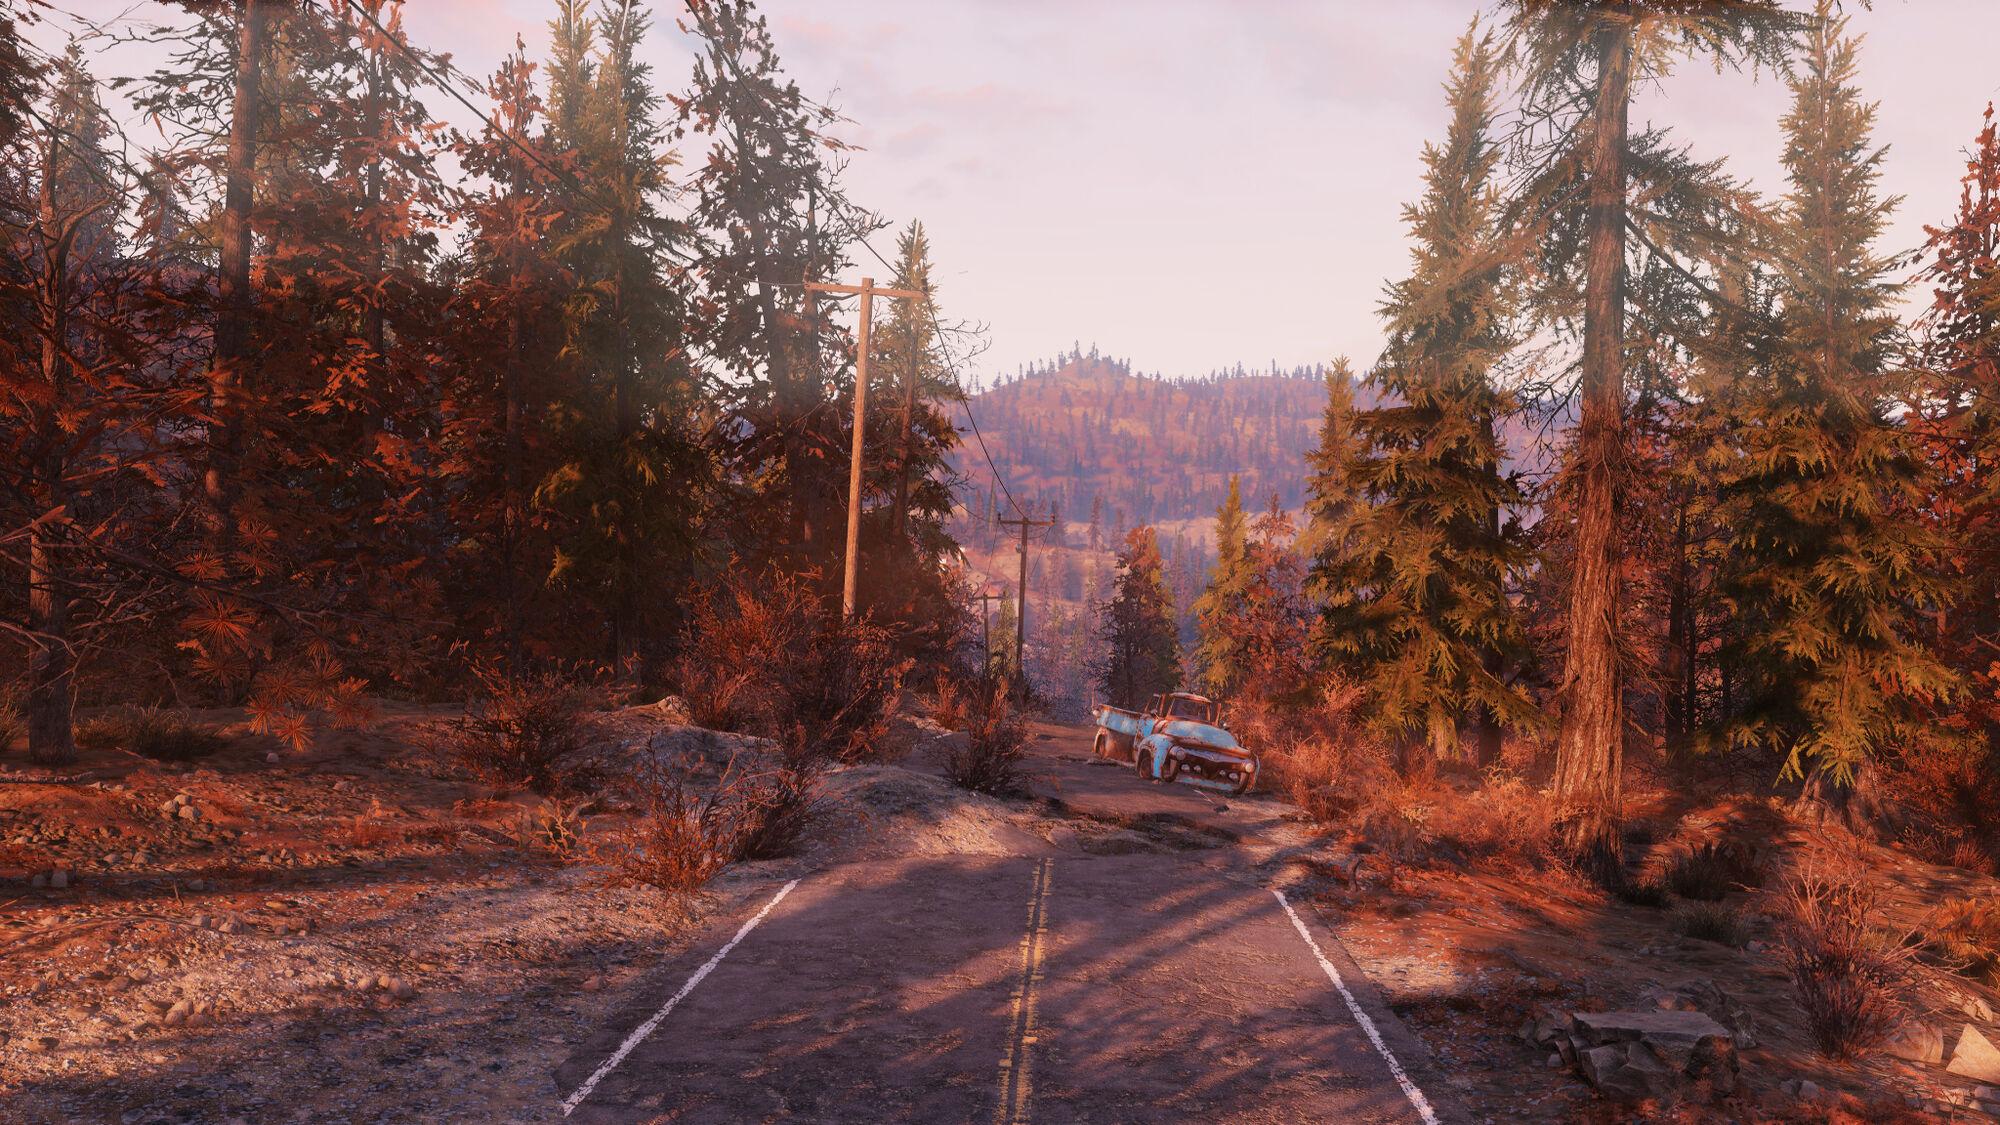 Fallout 76 loading screens | Fallout Wiki | FANDOM powered